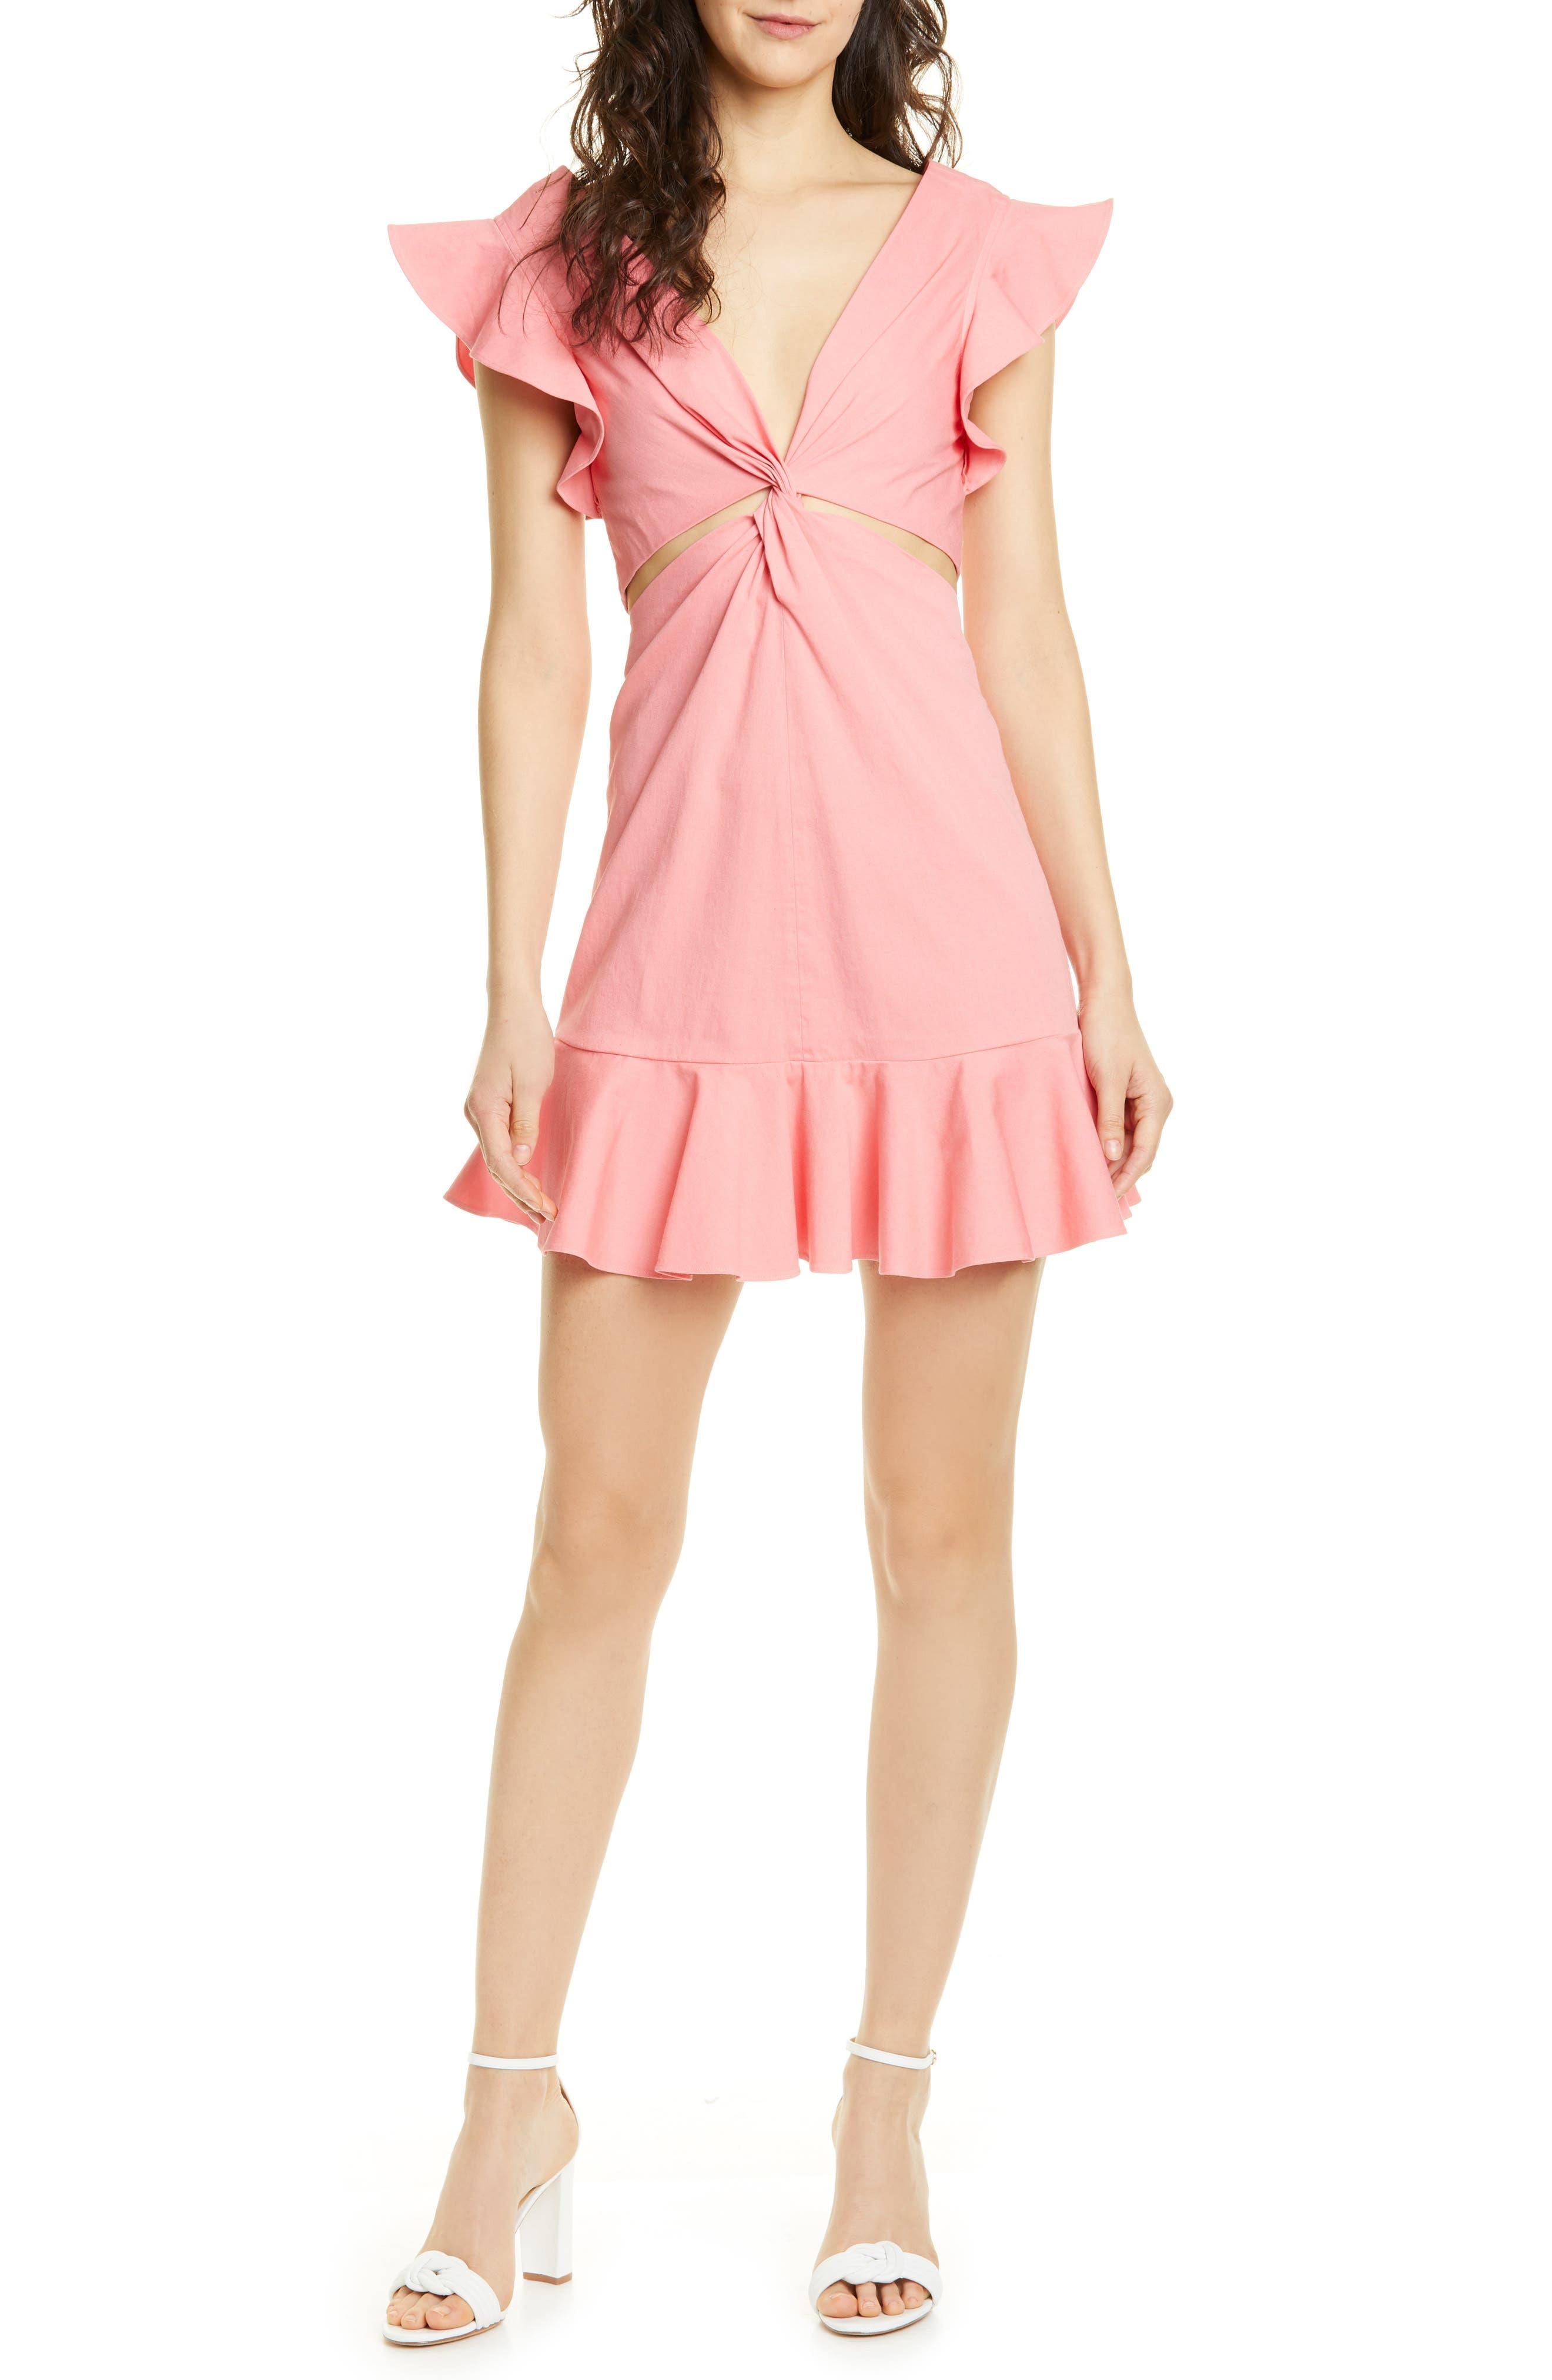 La Vie Rebecca Taylor Cutout Minidress, Pink